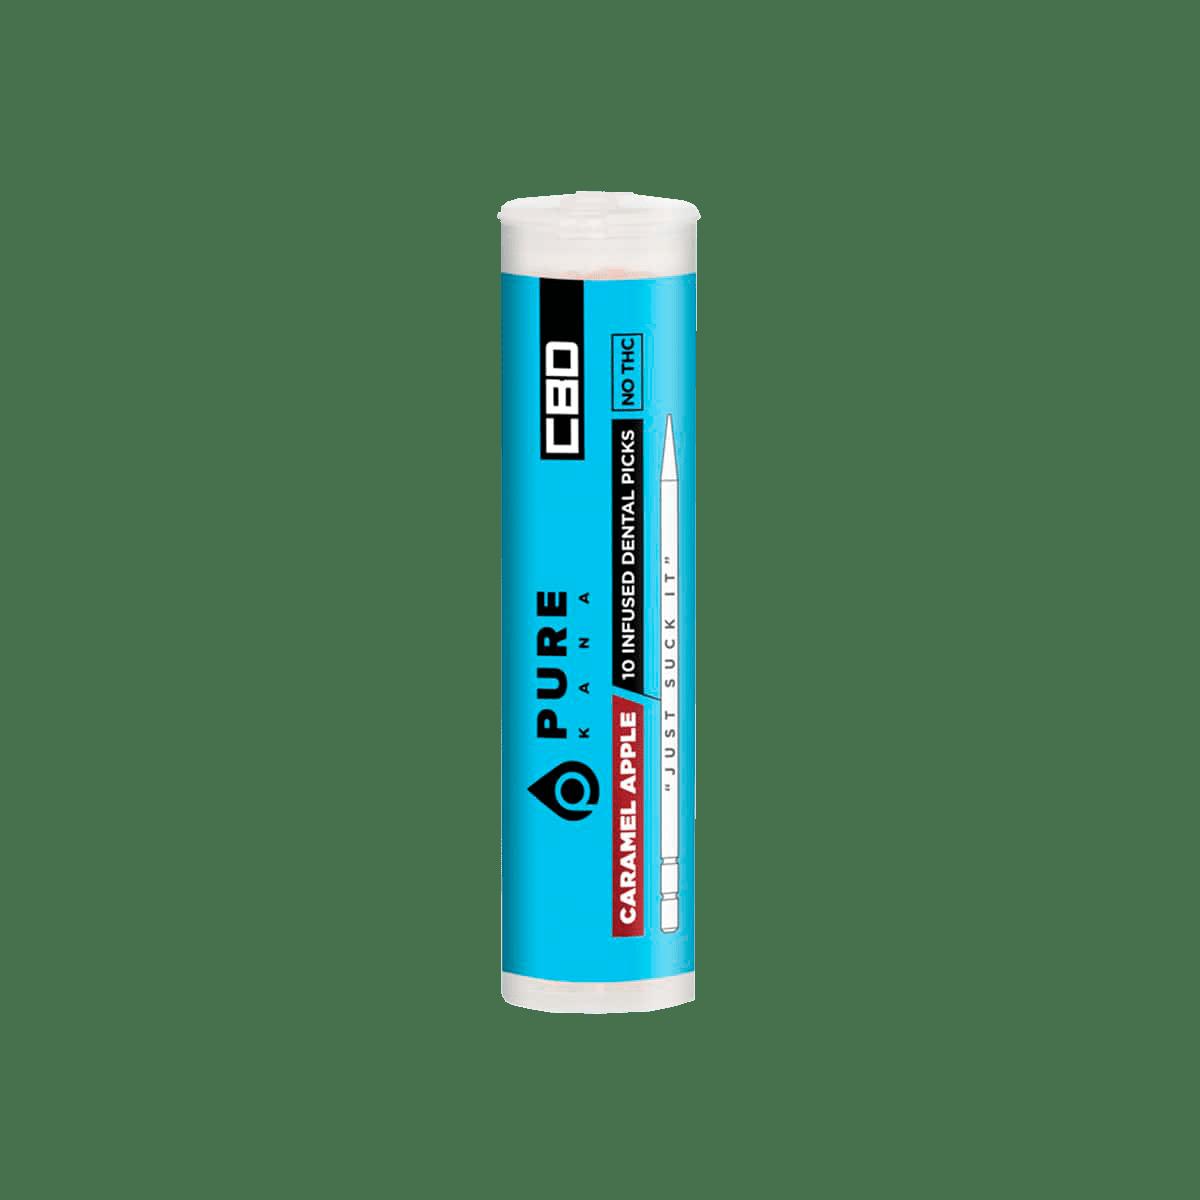 PureKana Caramel Apple CBD Pure Picks - 250mg (25mg CBD per pick)